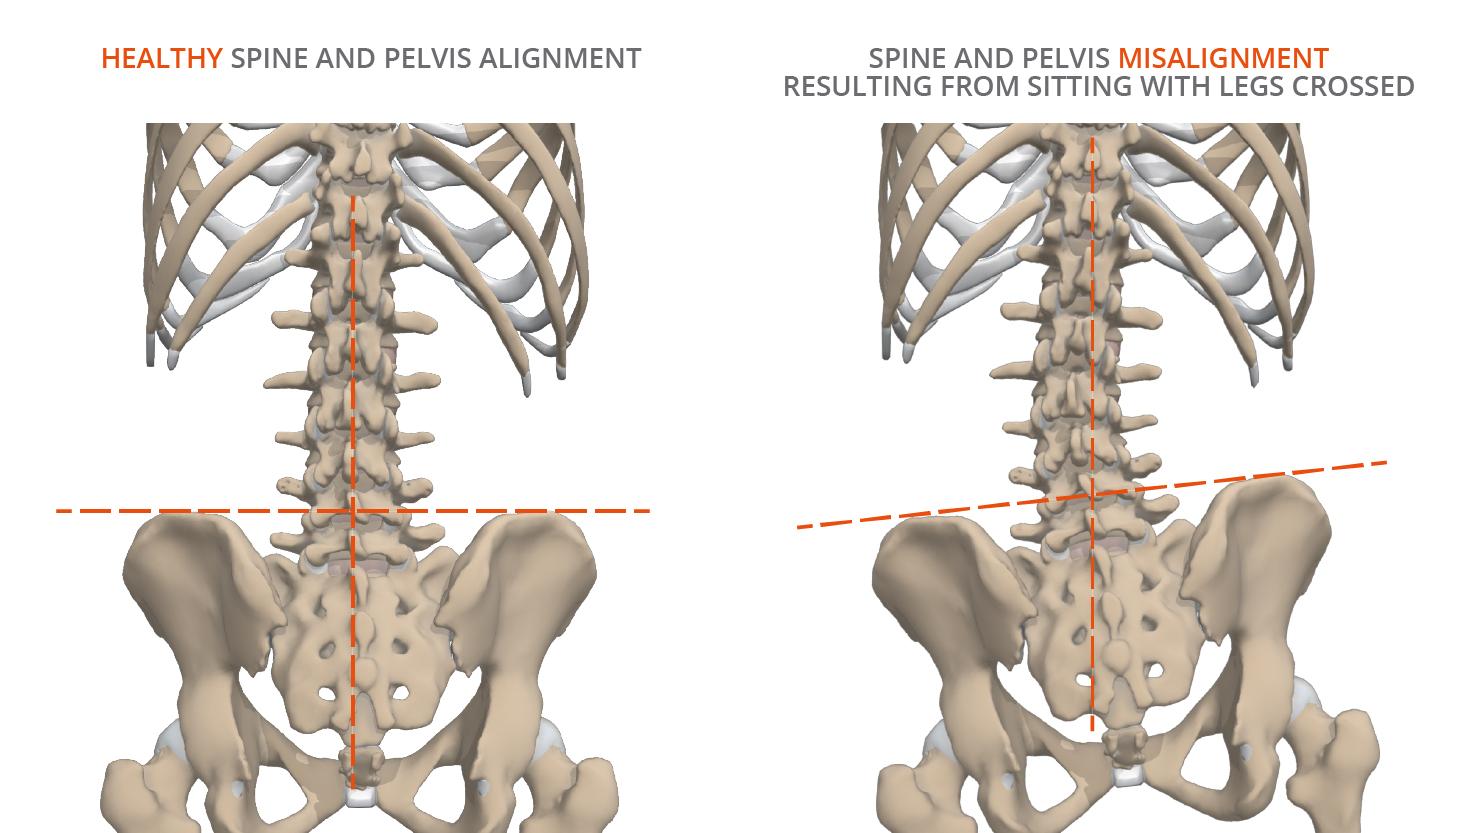 pelvis - spine - misalignment - alignment - anatomy - cross-legged - legs - crossed - Primal Pictures